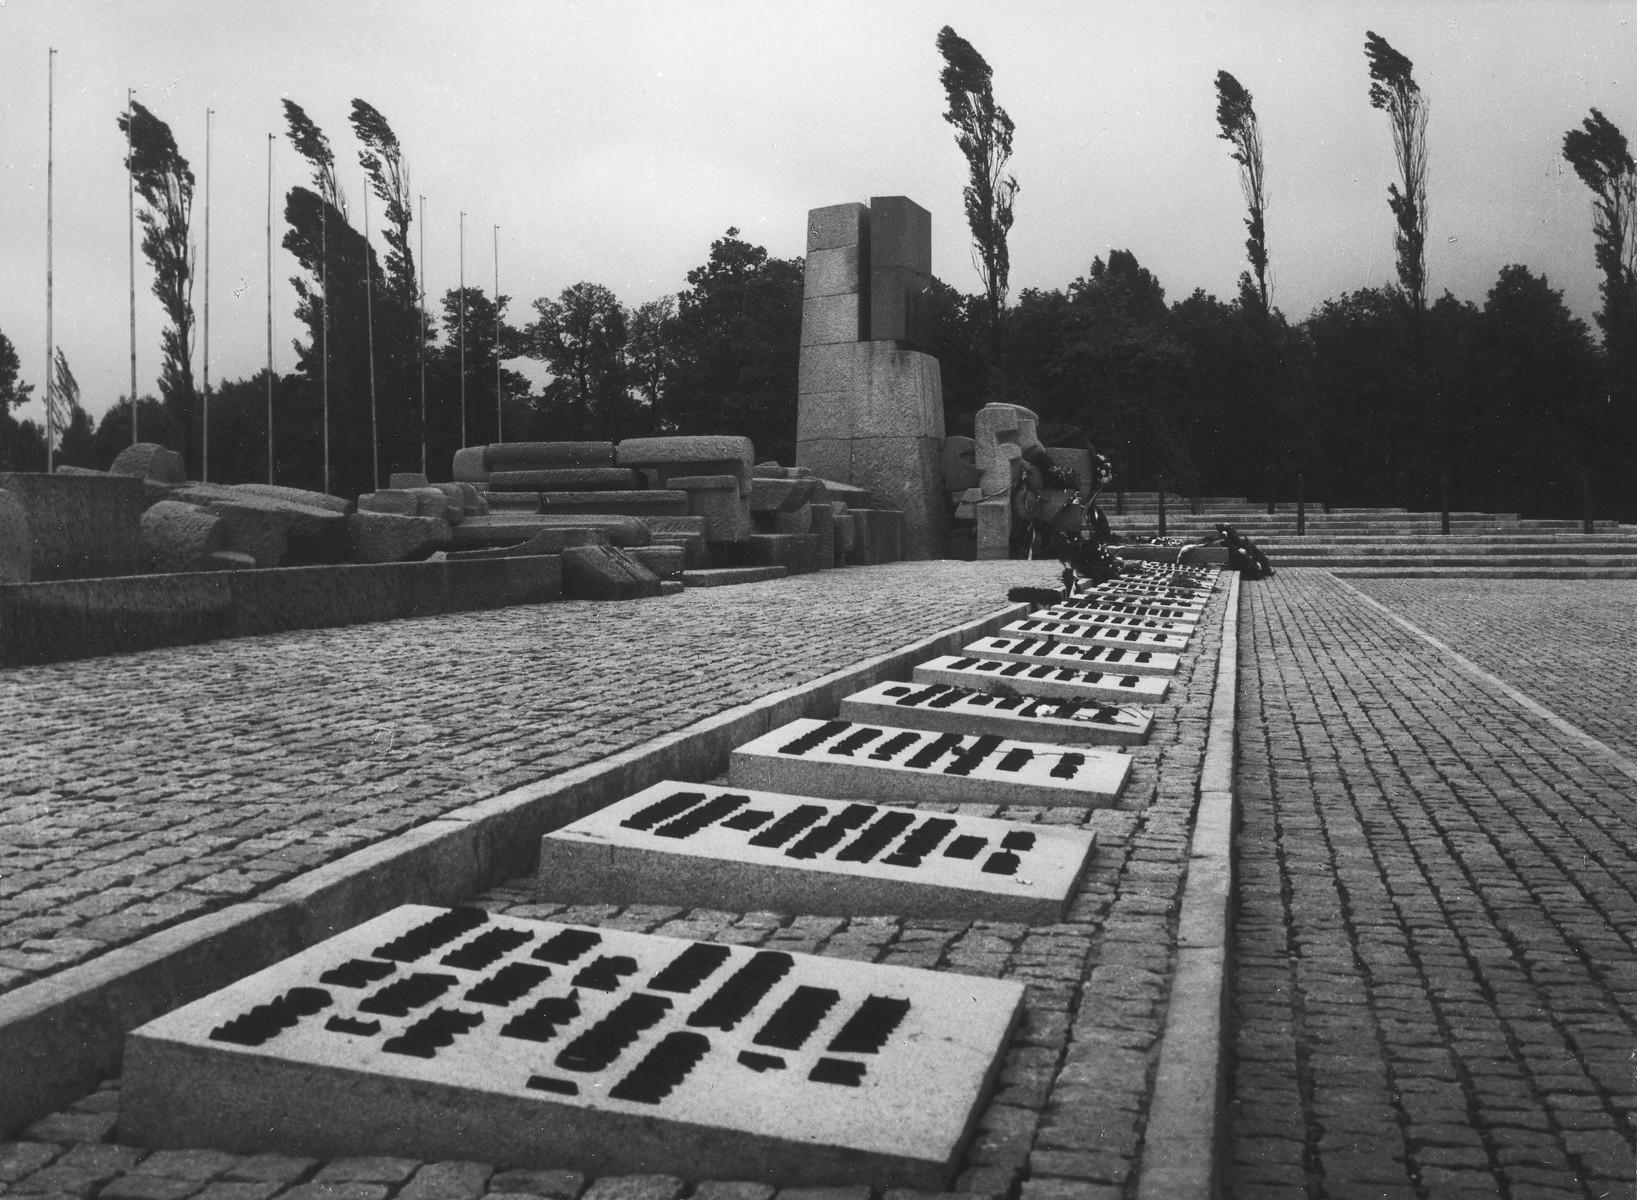 View of the memorial at Auschwitz-Birkenau.